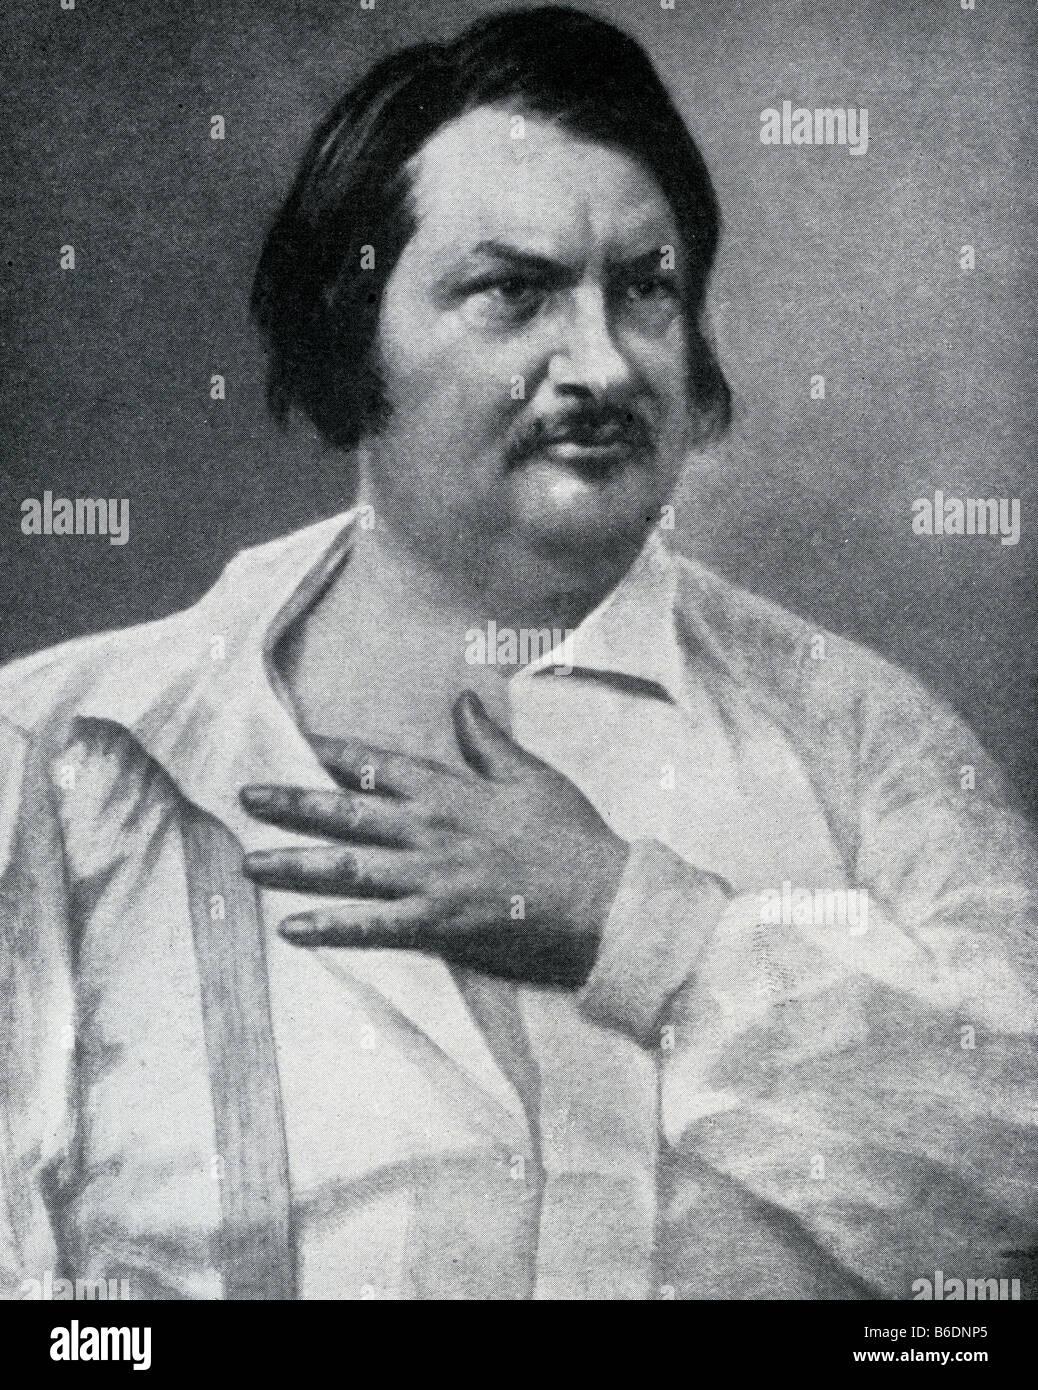 Honore de balzac 1799 1850 french novelist